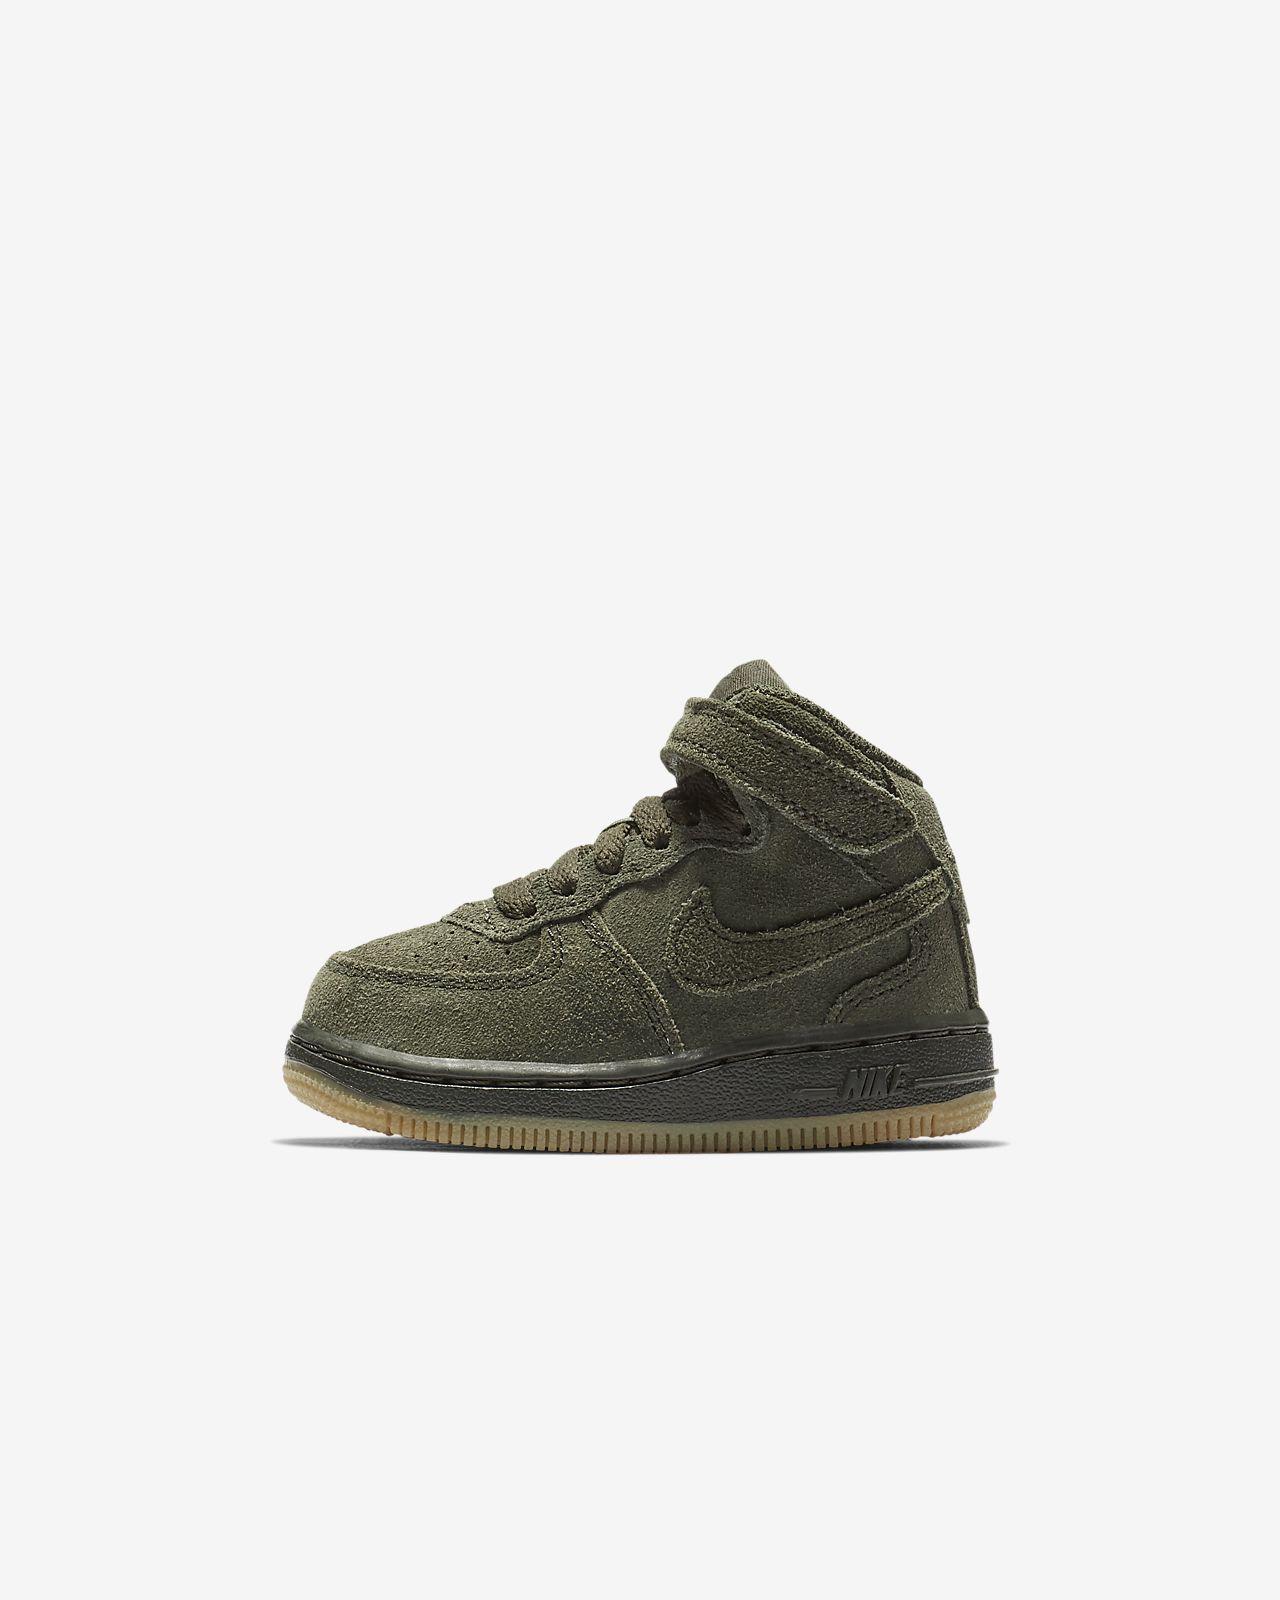 02b13be47a128 Nike Air Force 1 Mid LV8 Zapatillas - Bebé e infantil. Nike.com ES